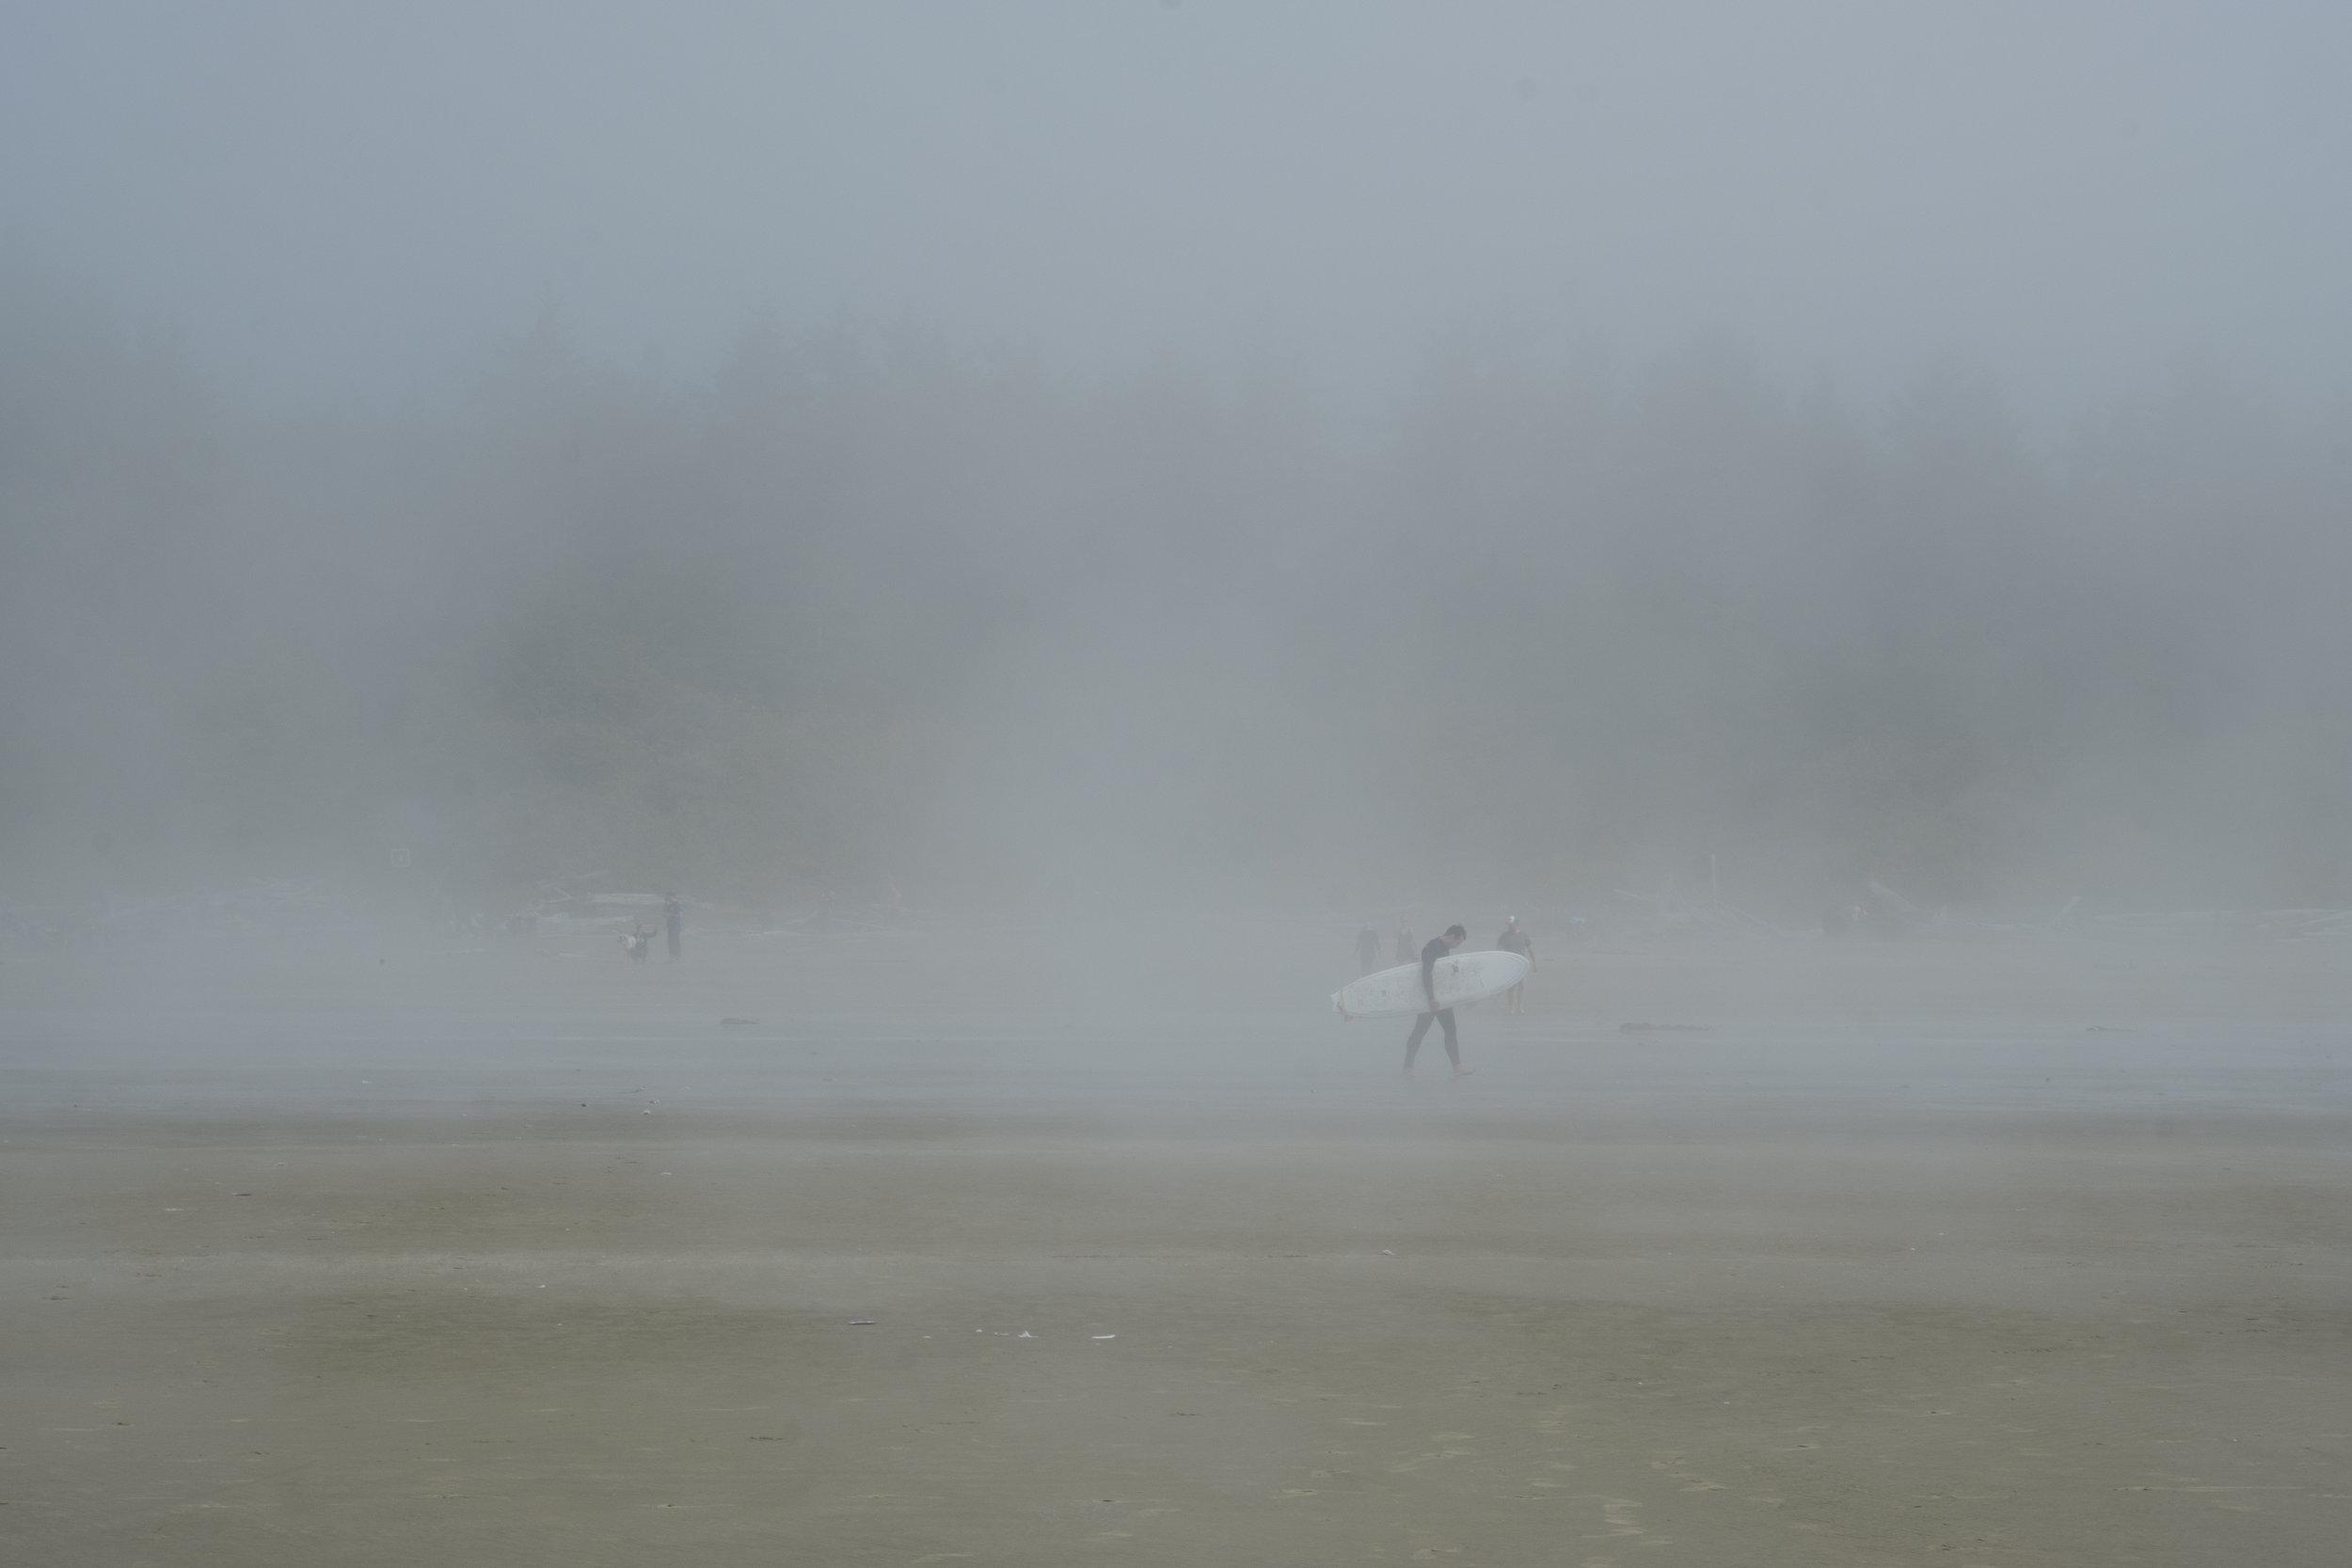 A surfer walking through a misty morning, Long Beach, Tofino